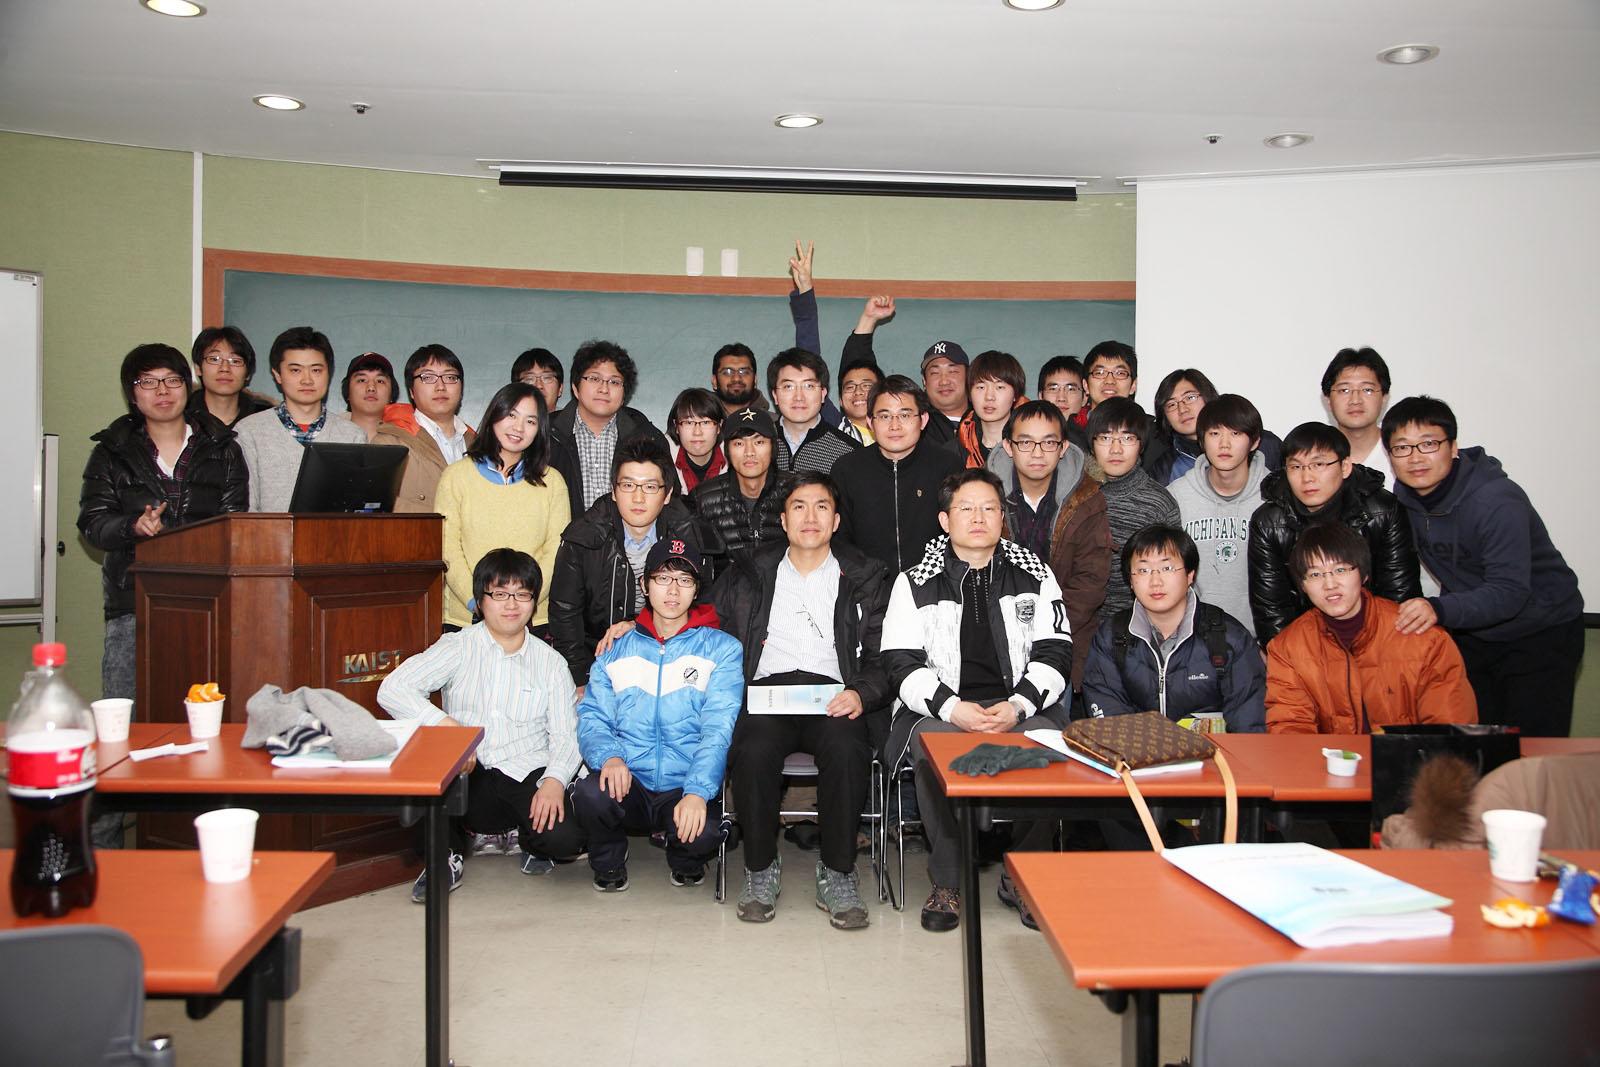 IMG_8968DPP.JPG